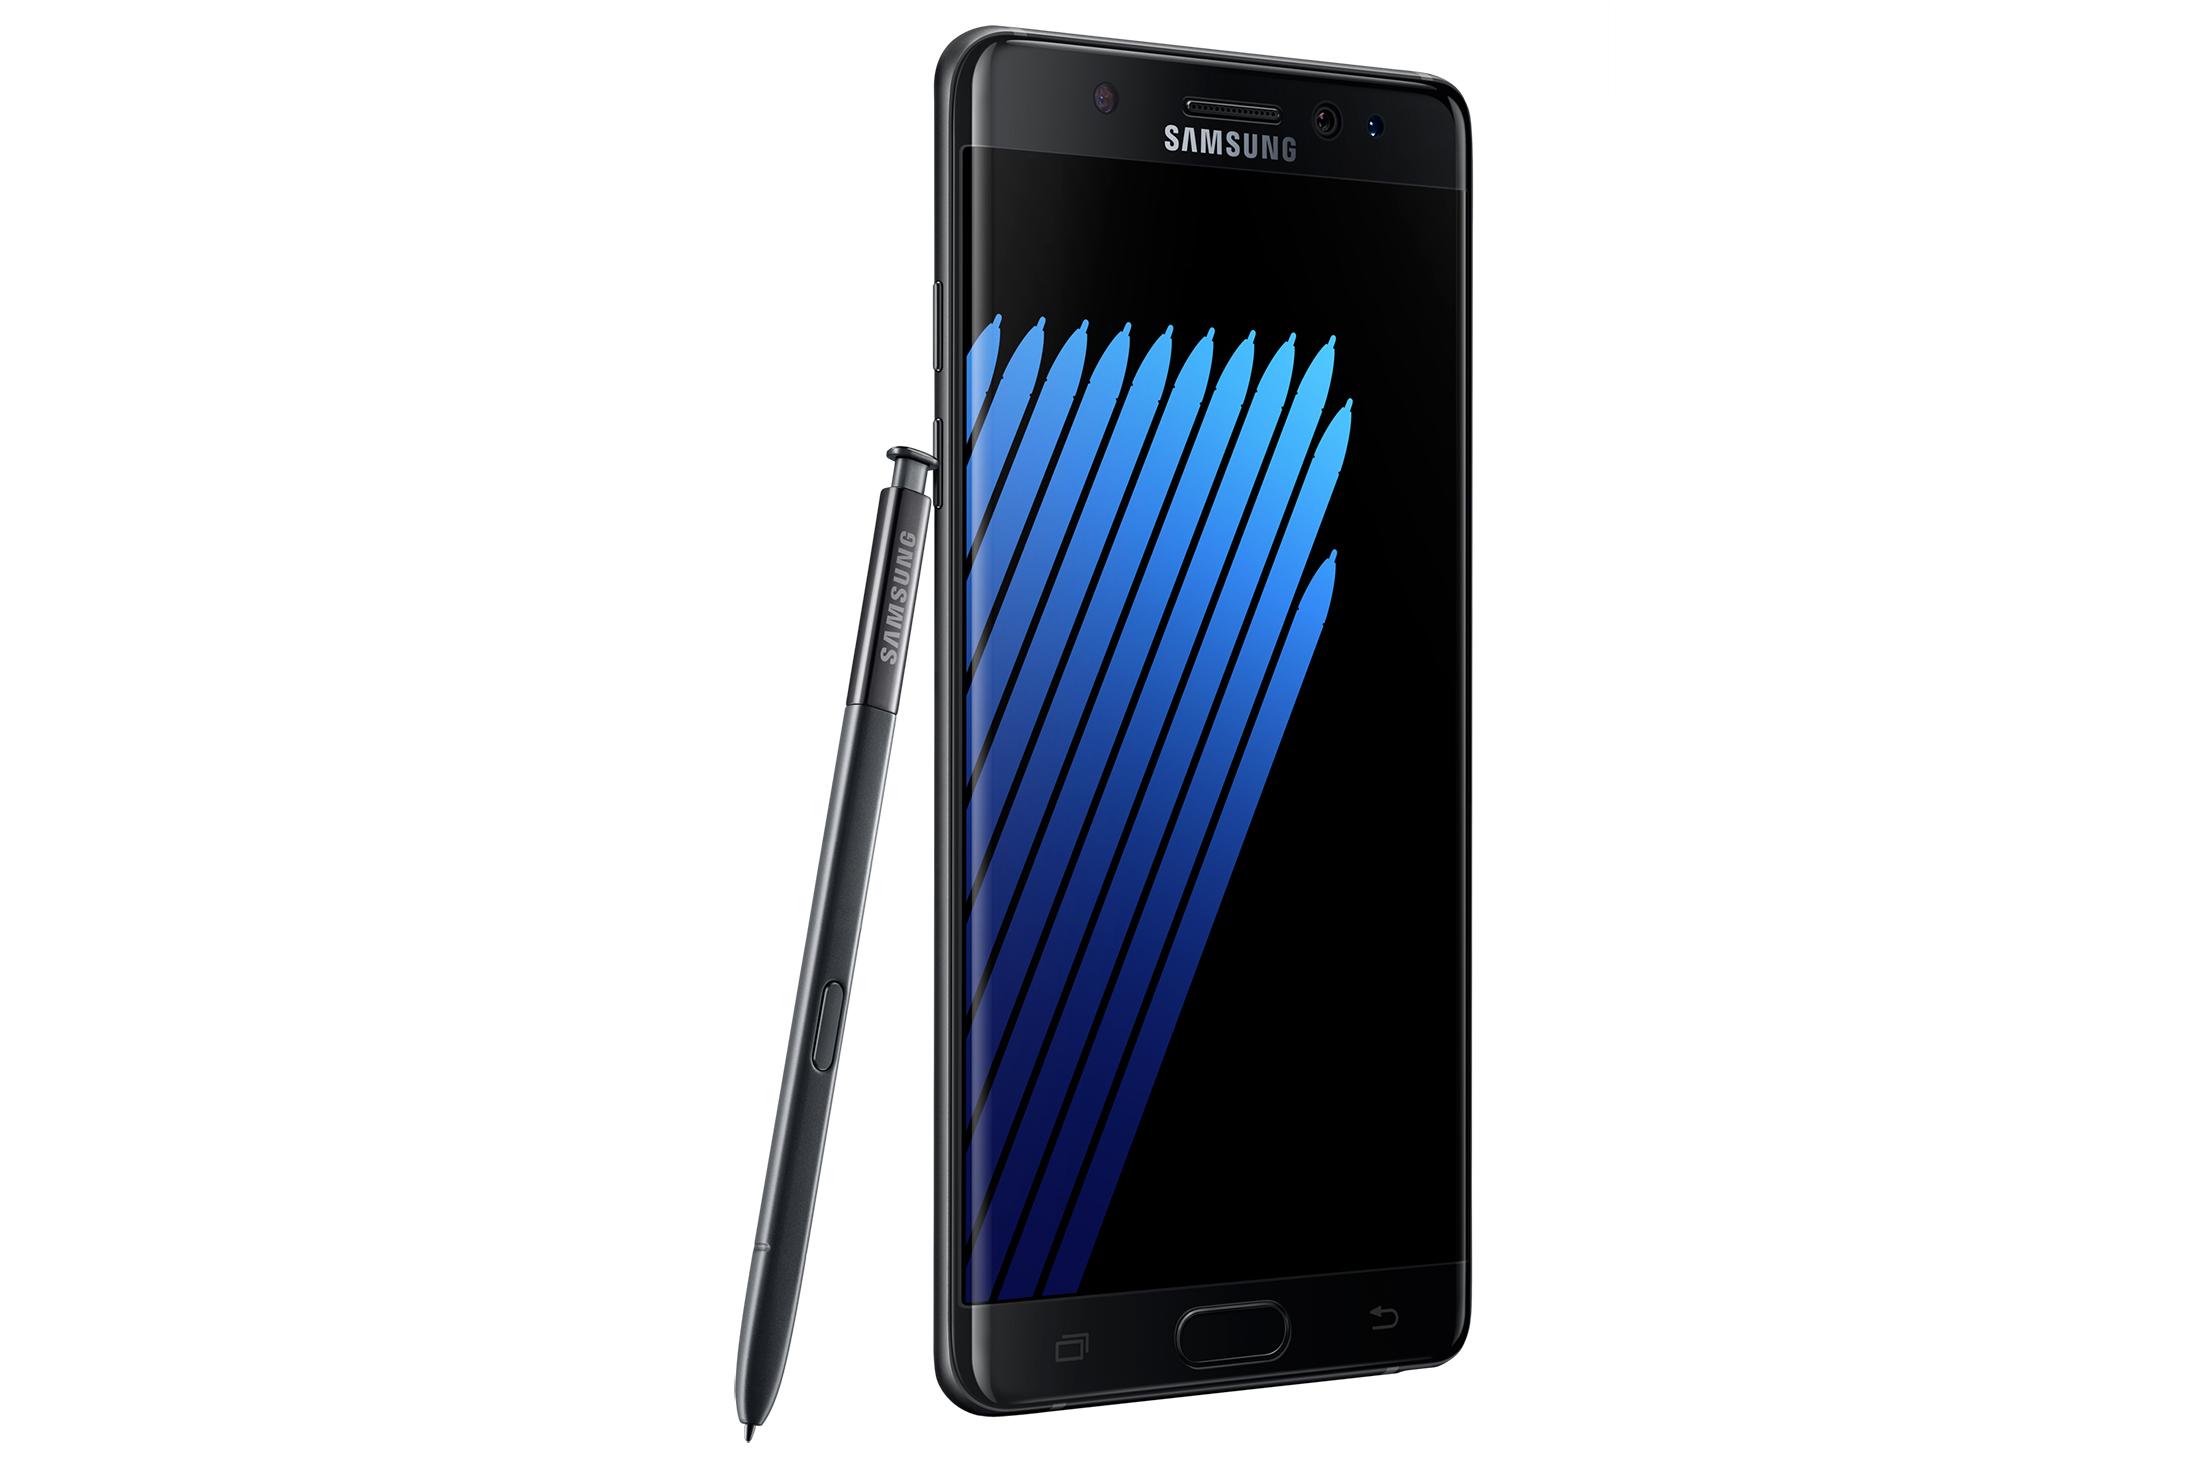 Samsung 03 Galaxy Note7 black (002) small (002) ed7daa412d